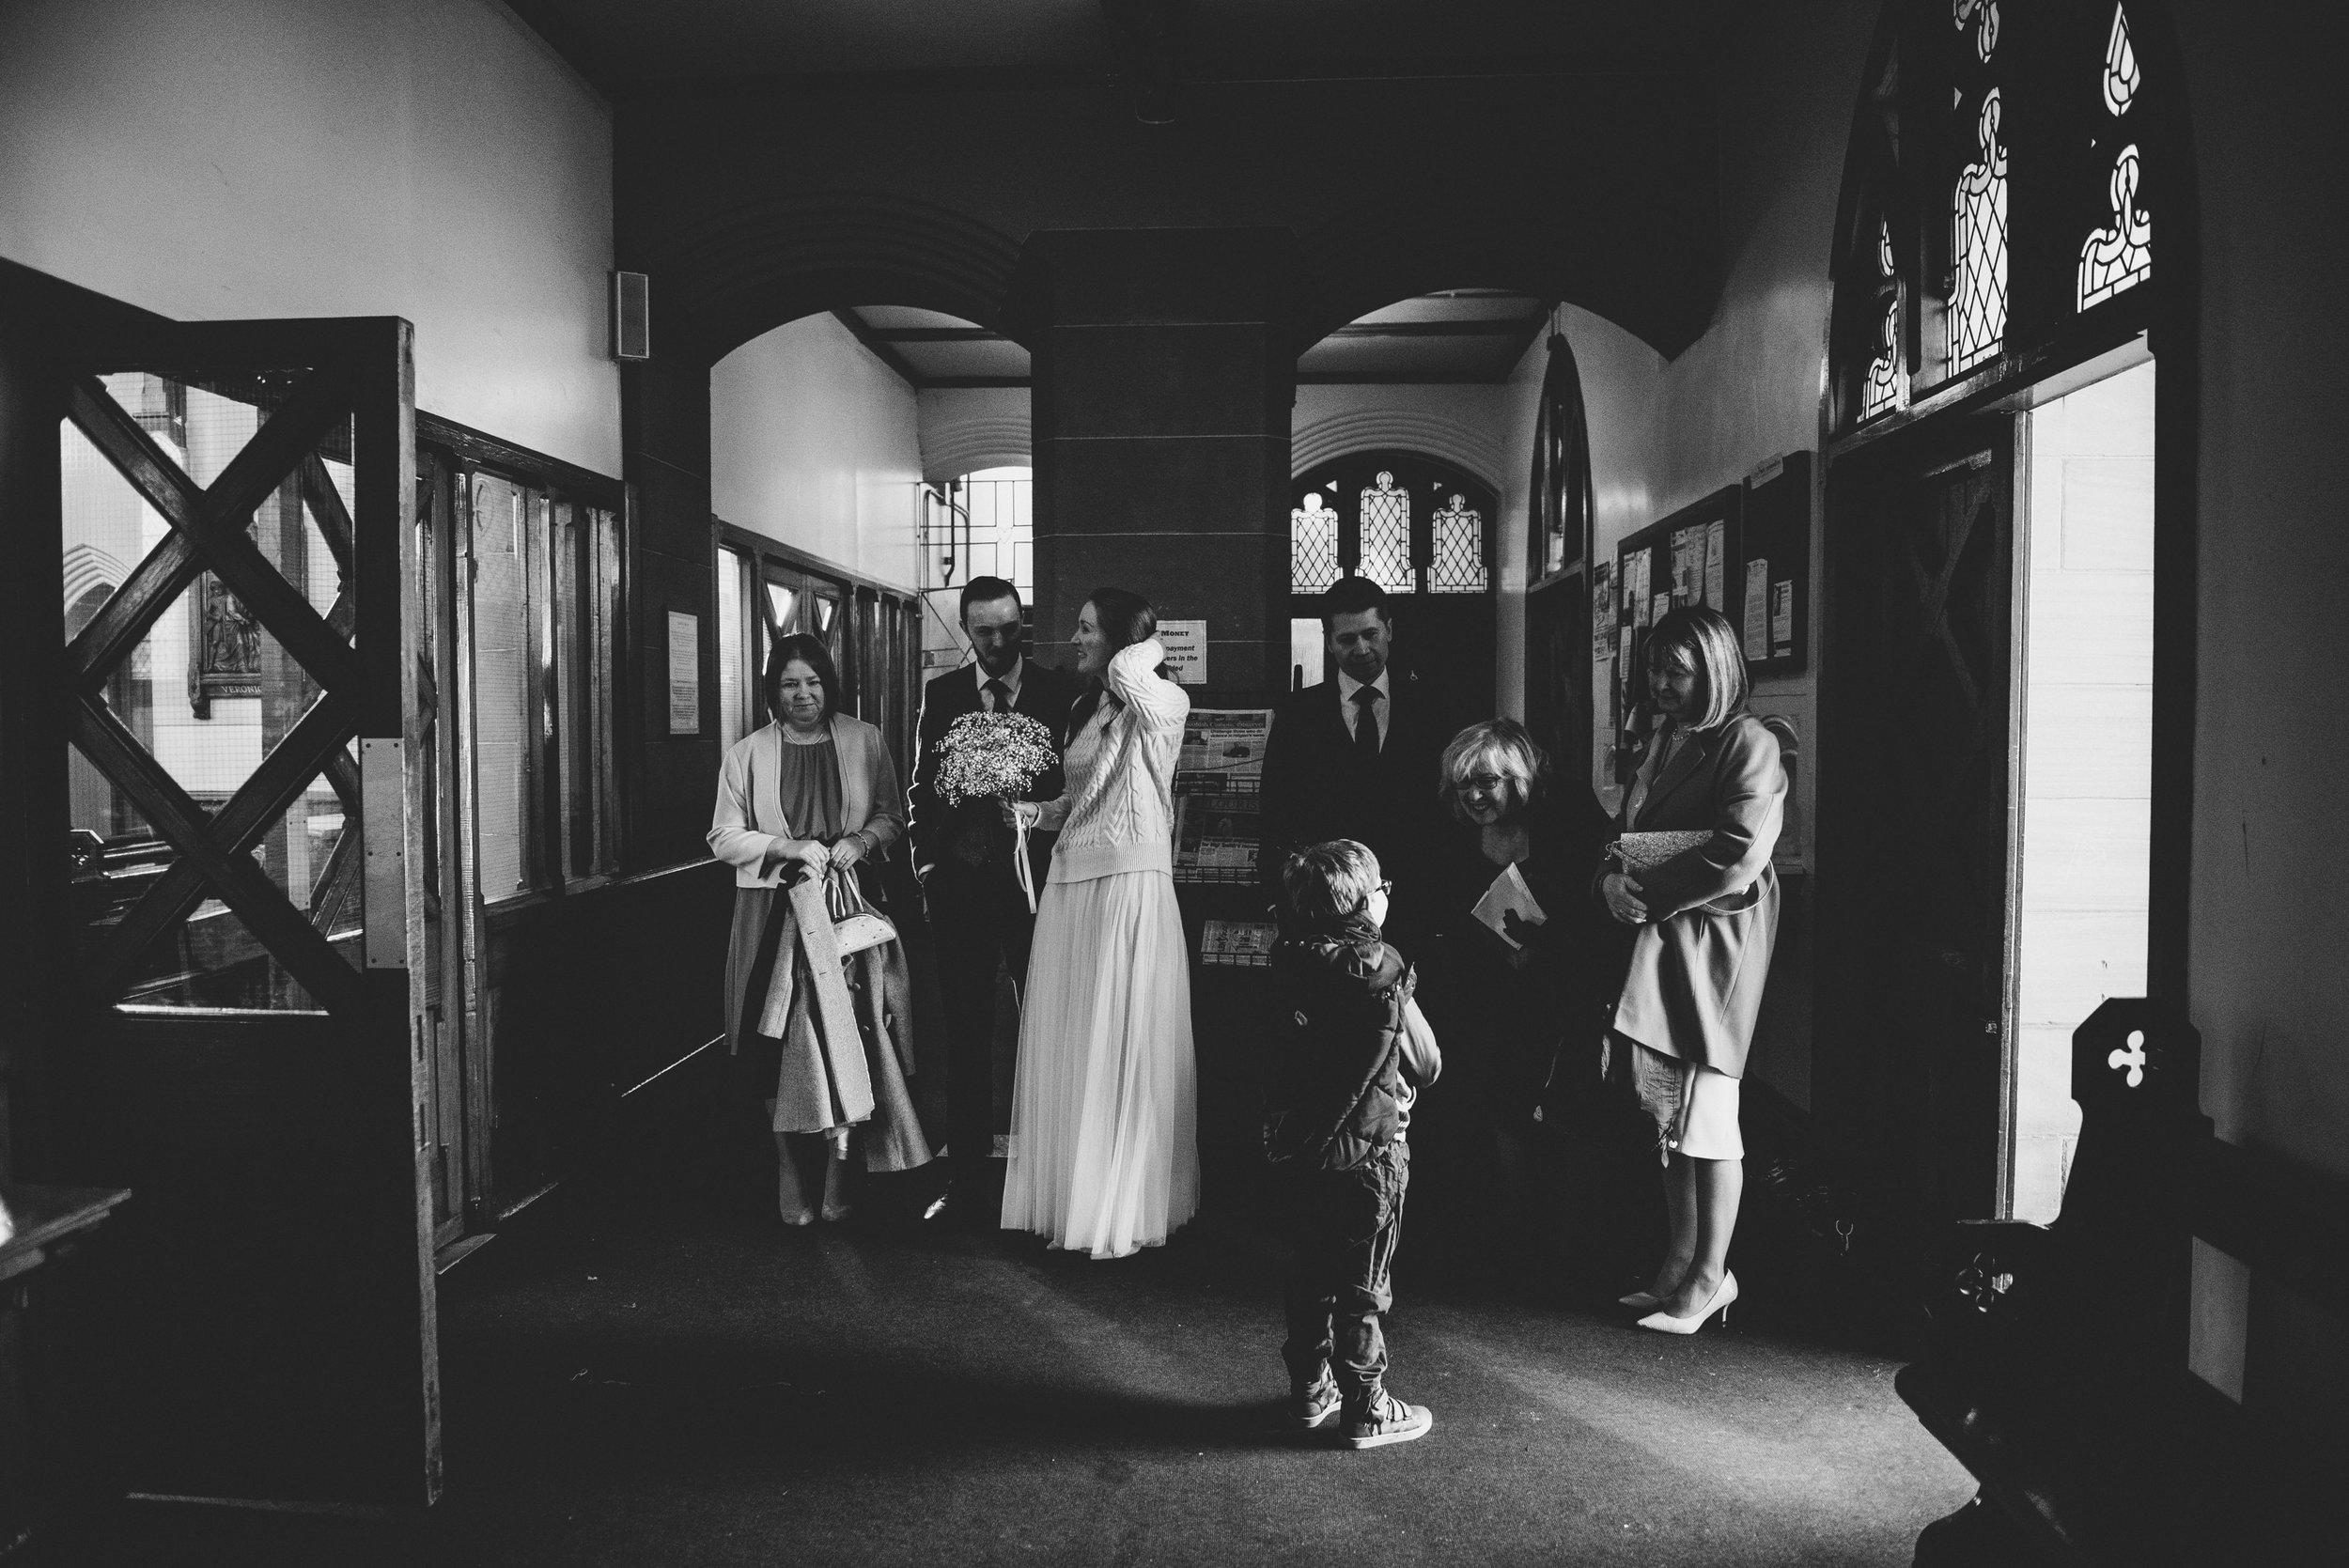 0237-LISA-DEVINE-PHOTOGRAPHY-ALTERNATIVE-WEDDING-PHOTOGRAPHY-SCOTLAND-DESTINATION-WEDDINGS-GLASGOW-WEDDINGS-COOL-WEDDINGS-STYLISH-WEDDINGS.JPG